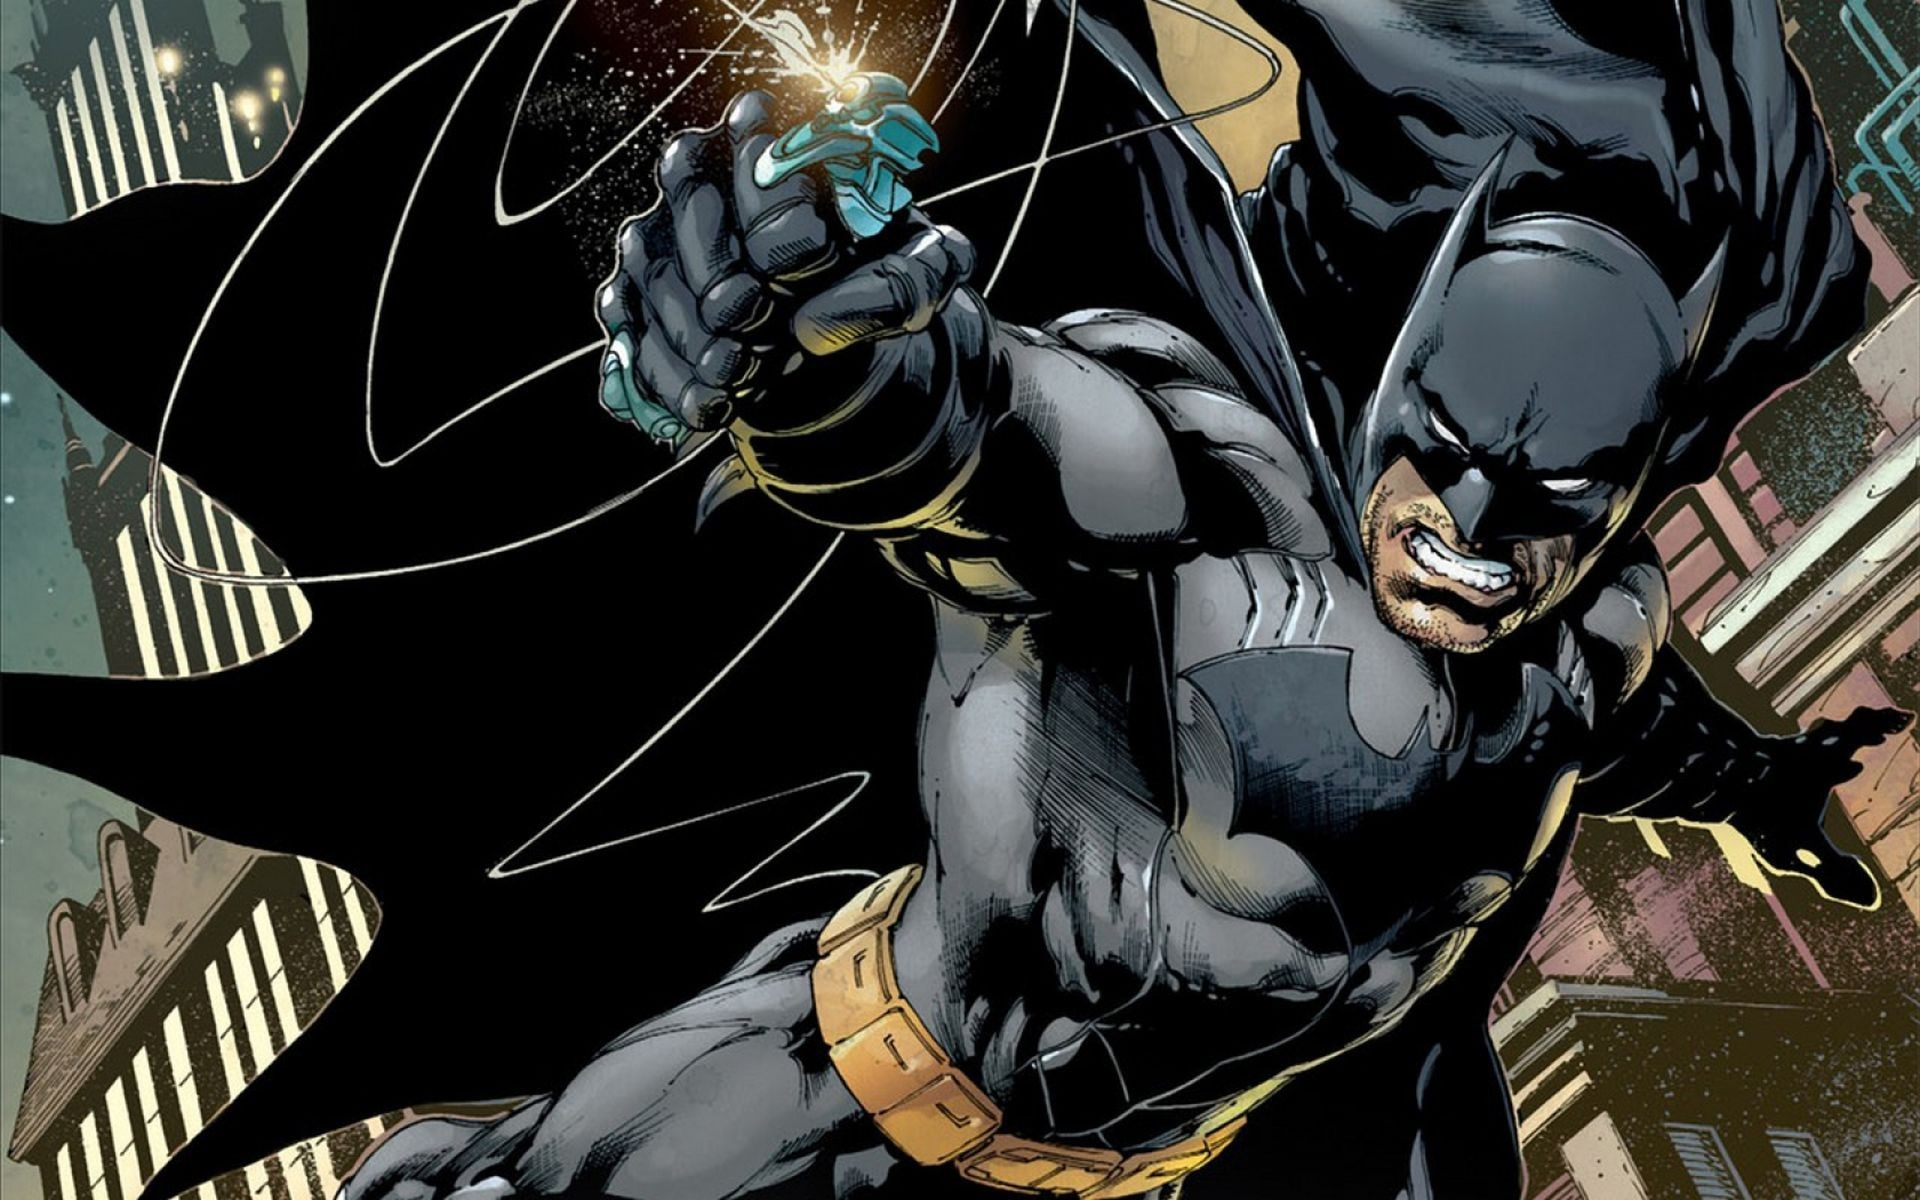 Batman Full HD Wallpaper And Background Image